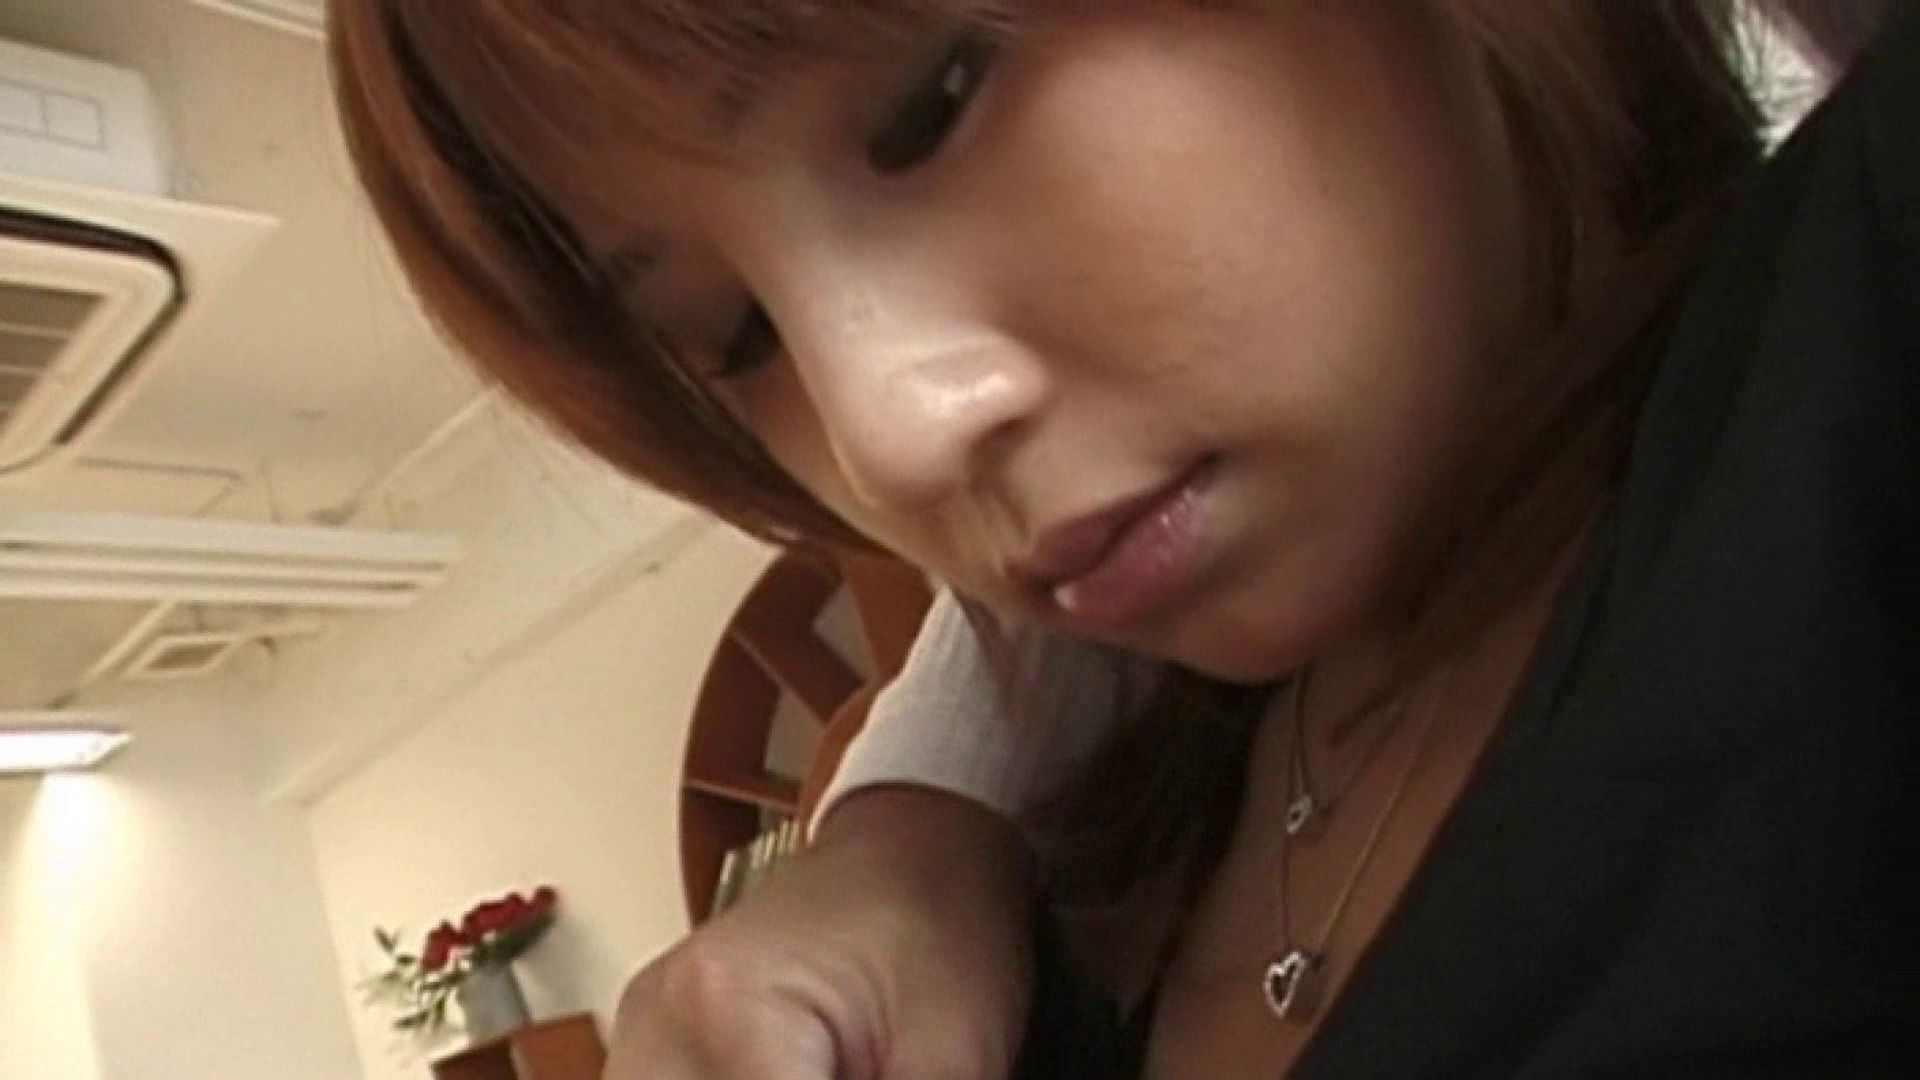 S級厳選美女ビッチガールVol.16 美女  55pic 15